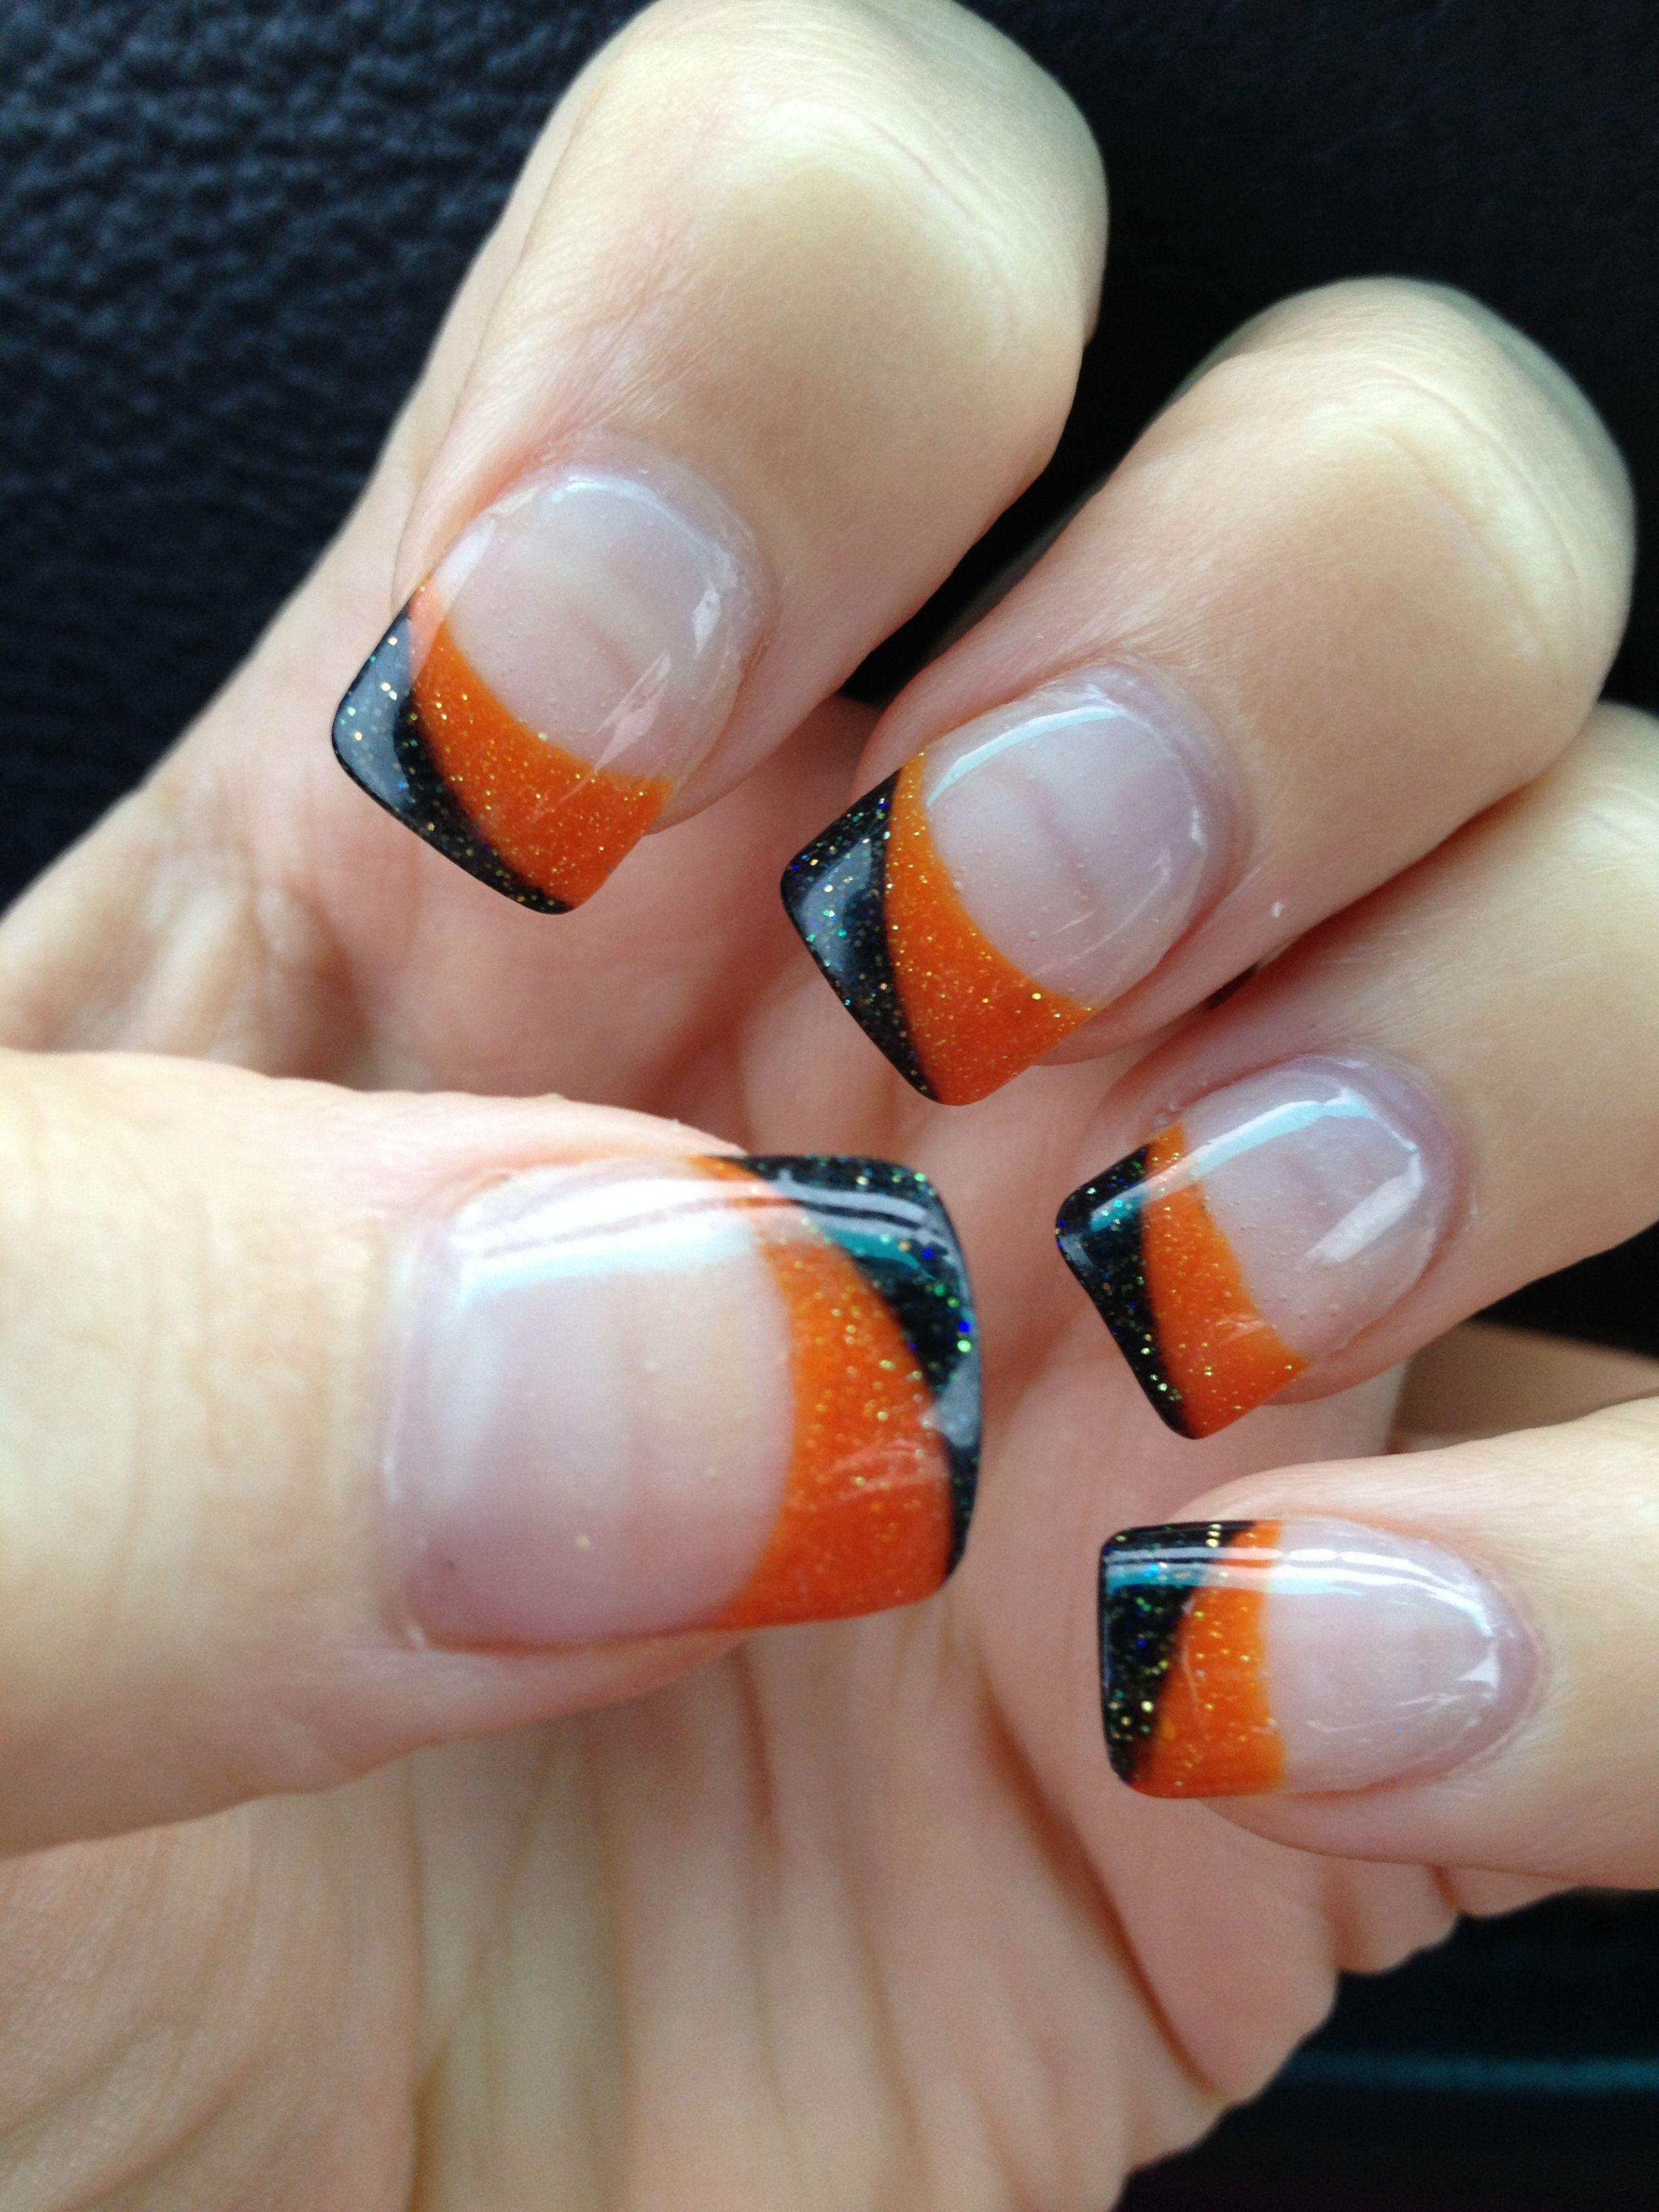 Orange And Black Nail Designs : orange, black, designs, Halloween, Acrylic, Nails., Black,, Orange,, Sparkley., Nails,, Holloween, Nails